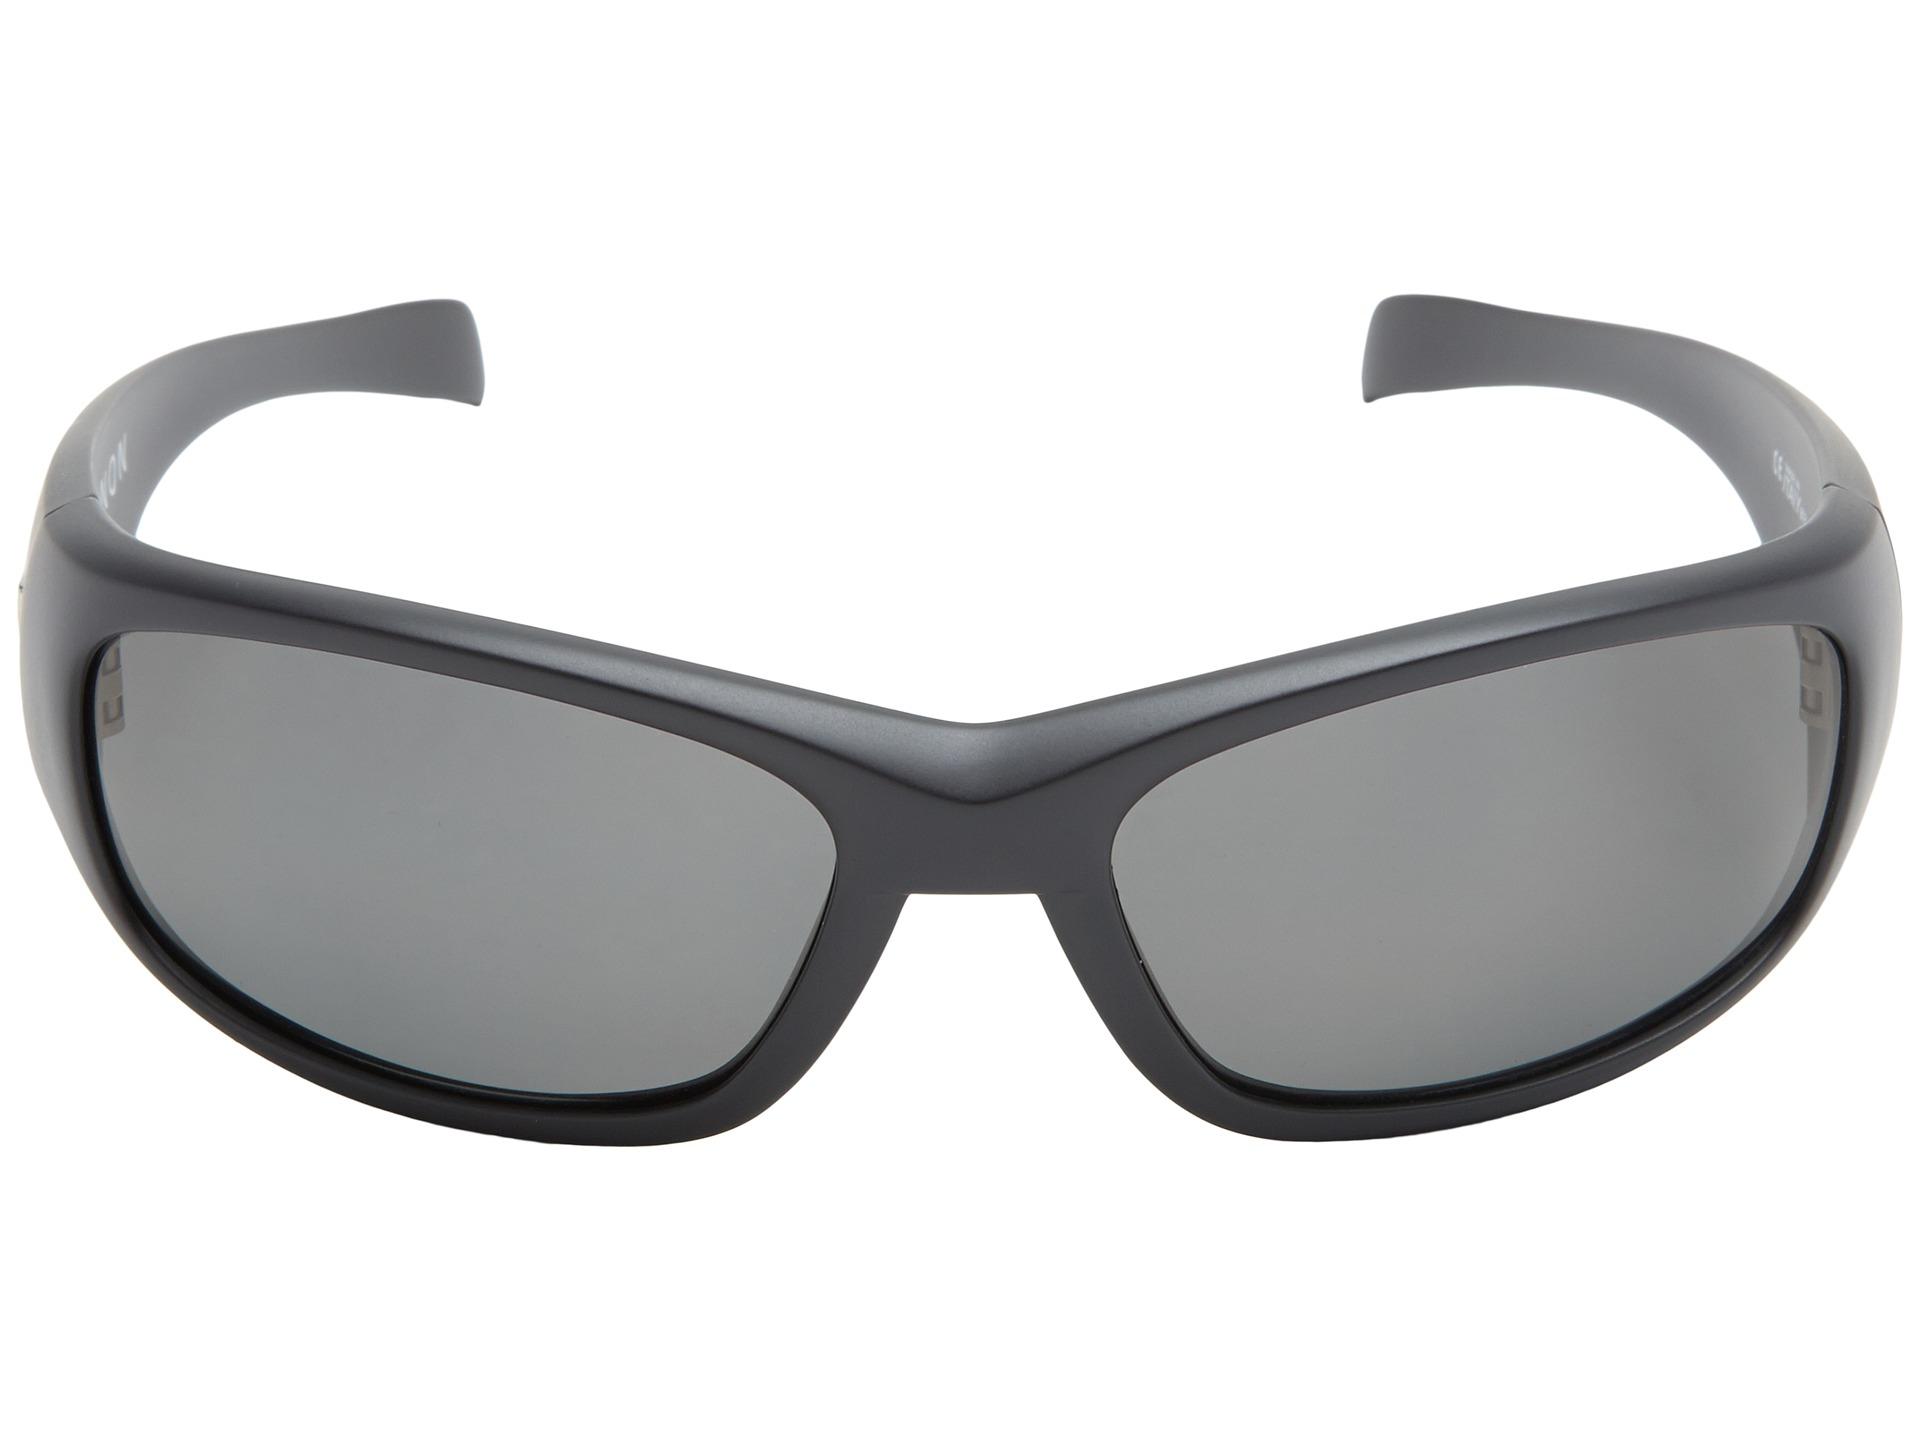 5f1802affd9 Lyst - Kaenon Rhino Sr91 (polarized) in Black for Men